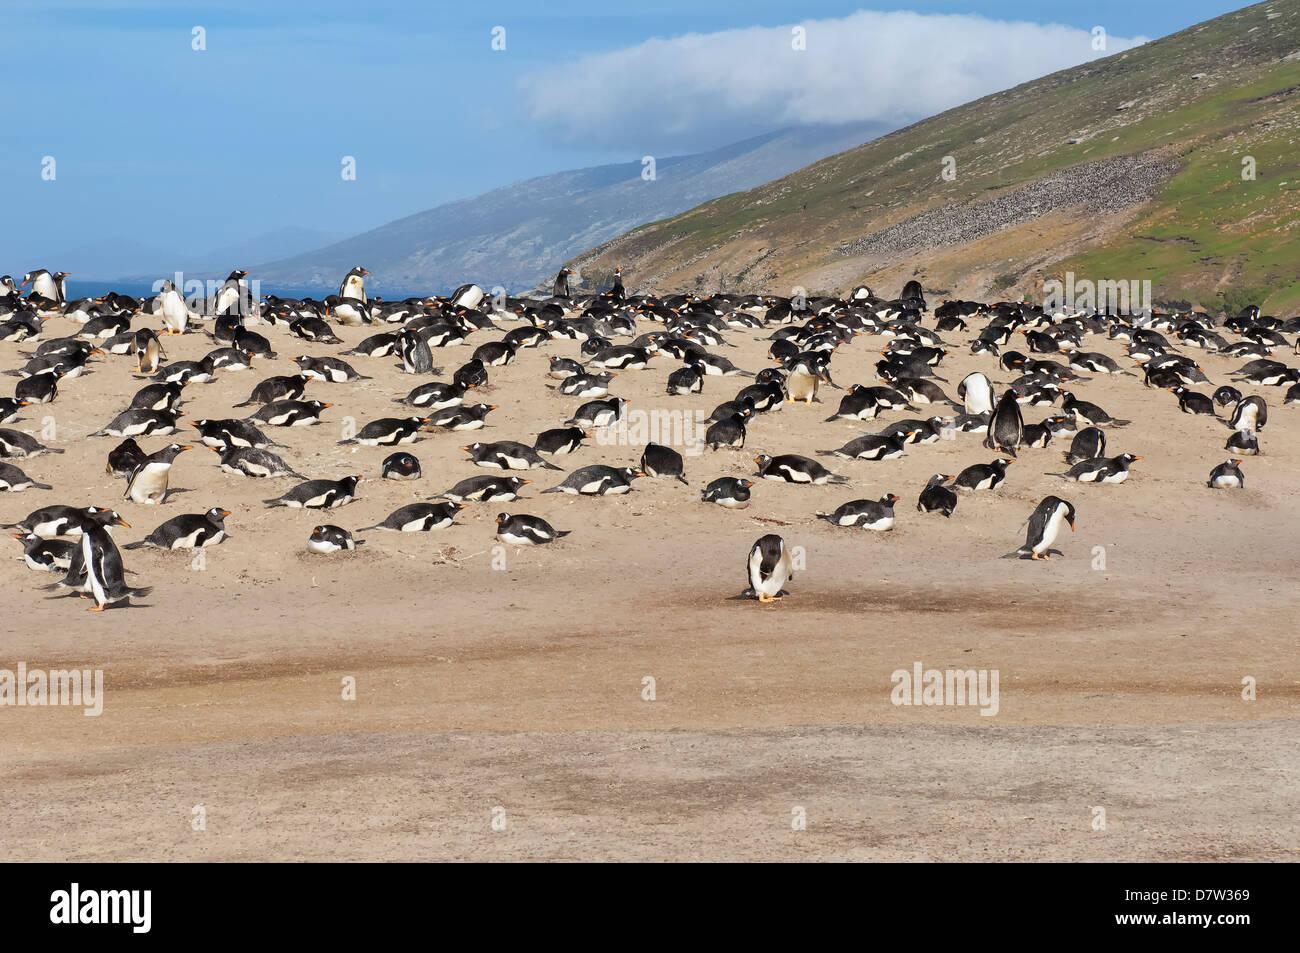 Gentoo penguin (Pygoscelis papua) rookery, Saunders Island, Falkland Islands, South America - Stock Image